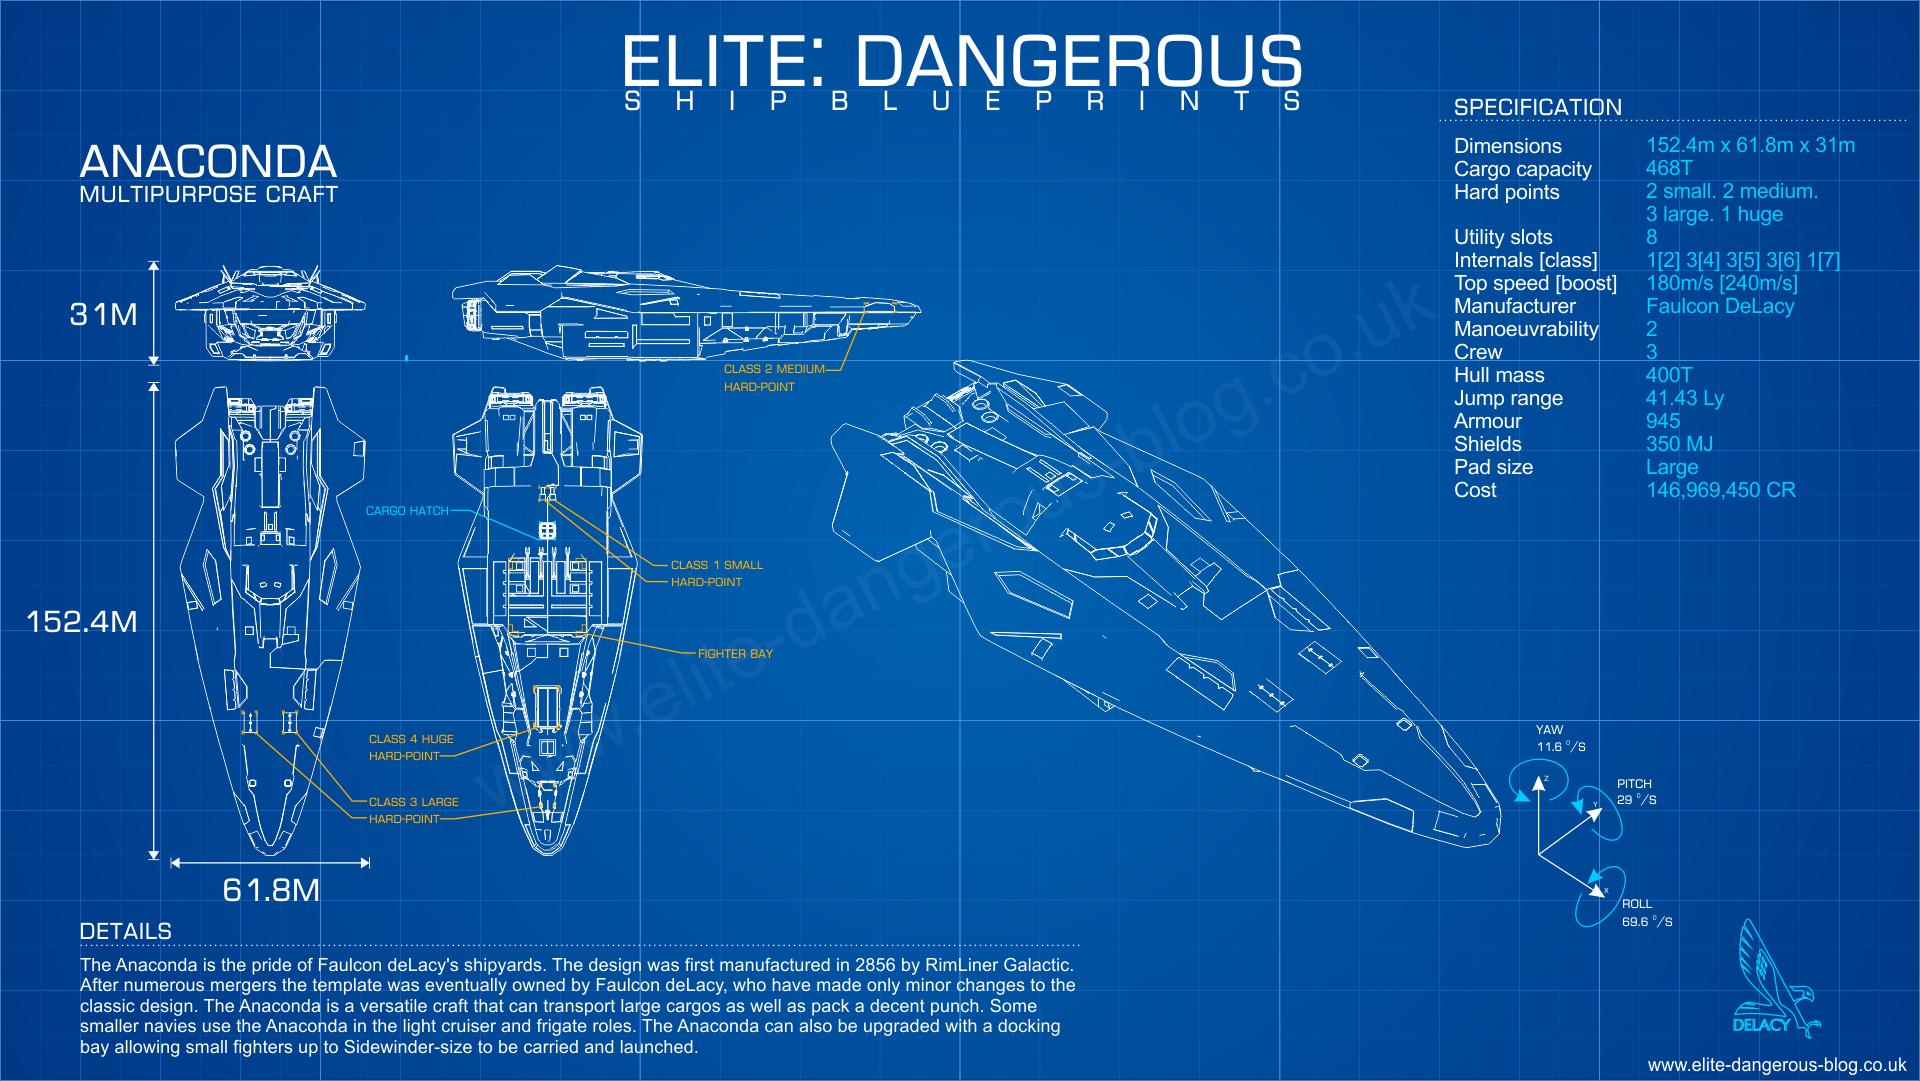 Anaconda Elite Dangerous Ships And Guides Swat Portal